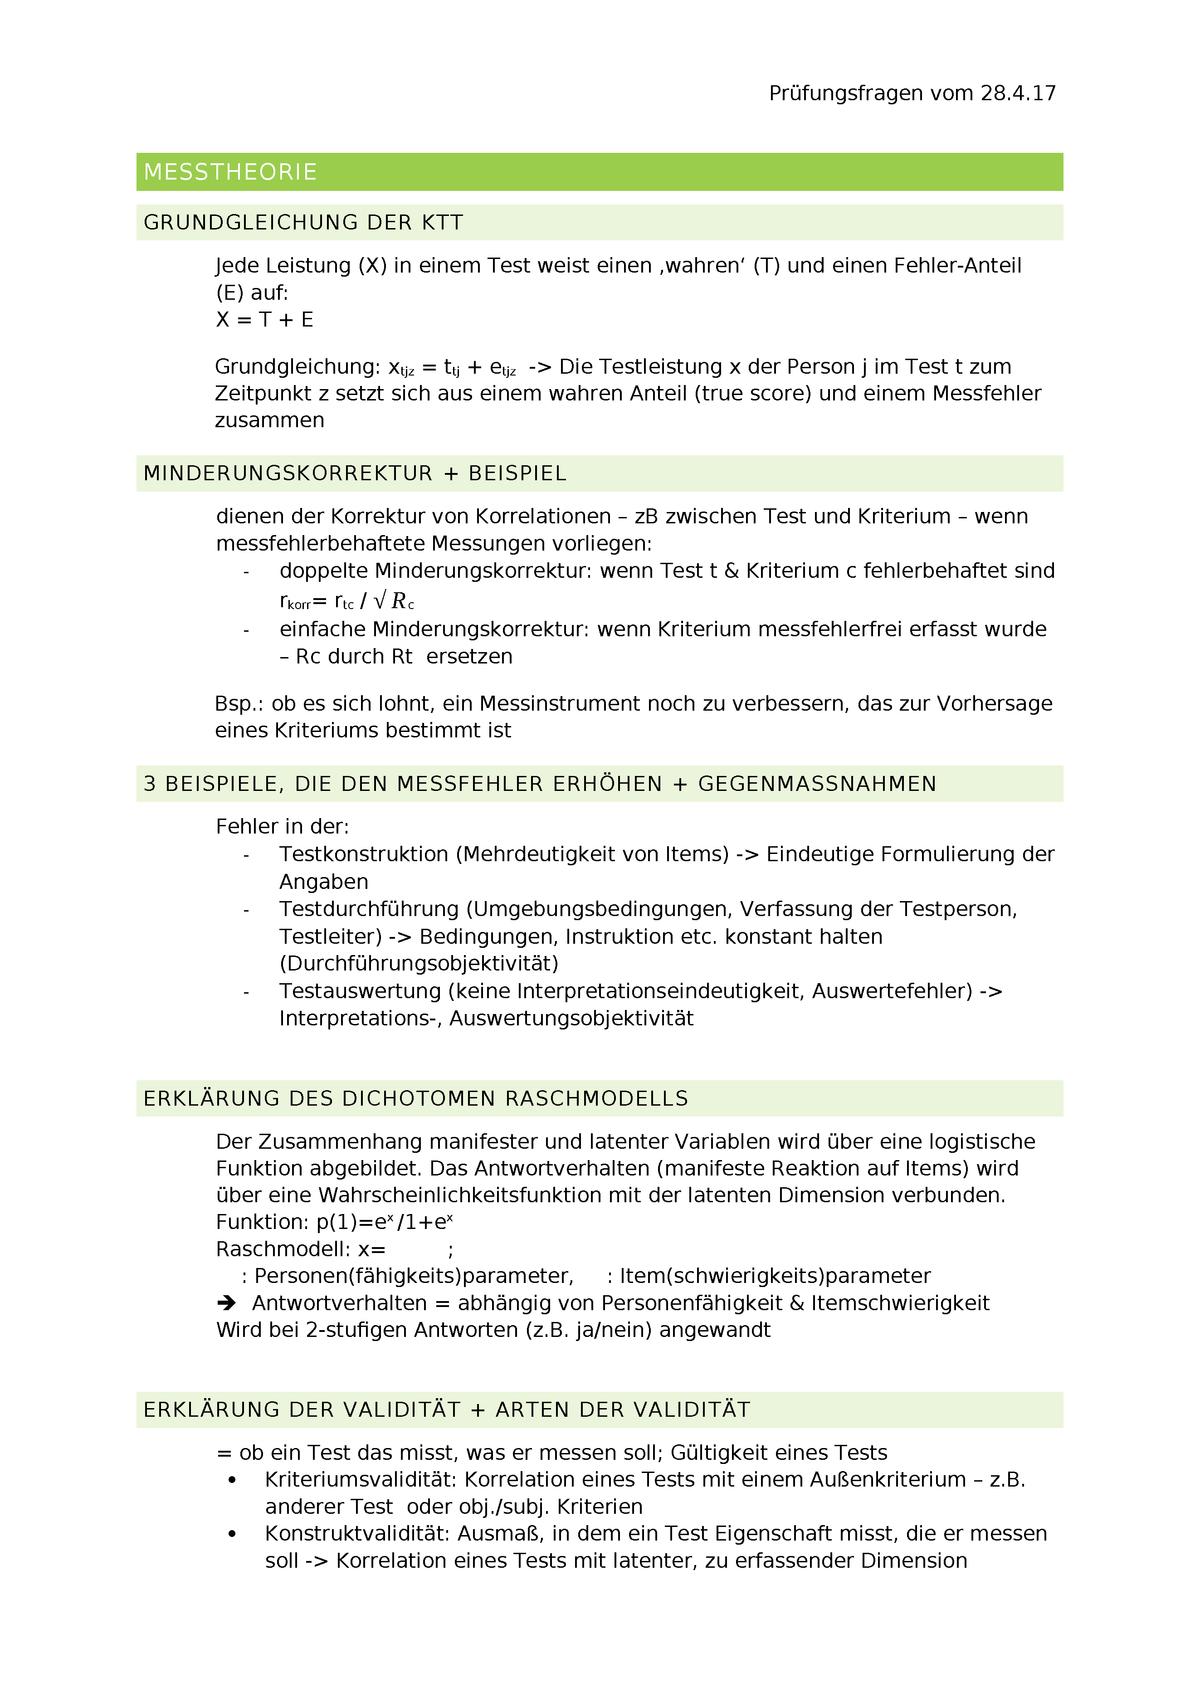 Kriteriumsvalidität